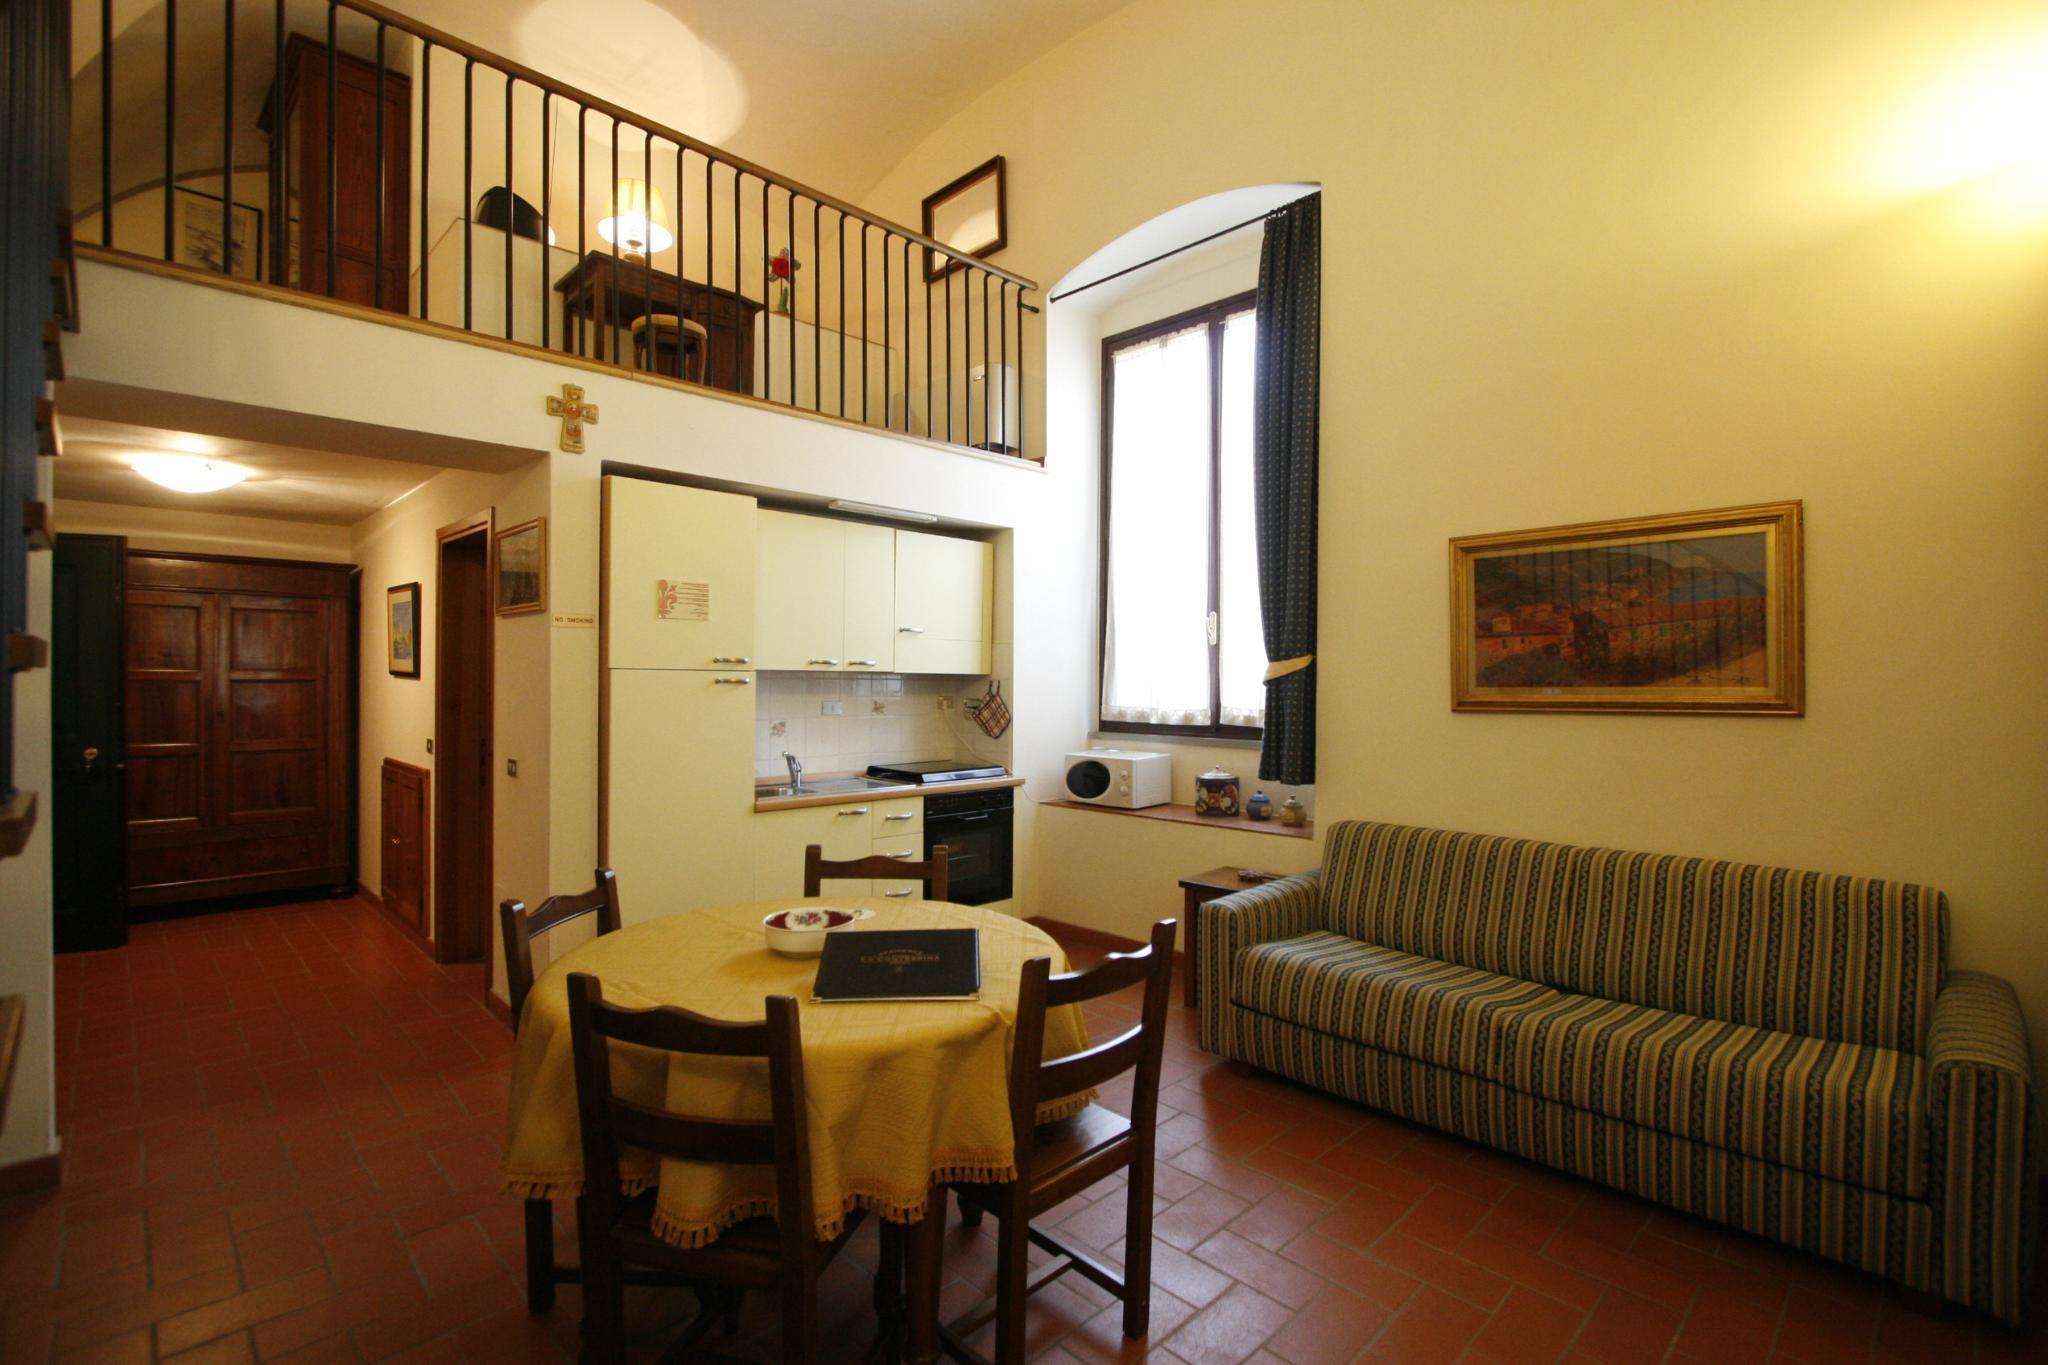 Apartment capacity 5 one bedroom